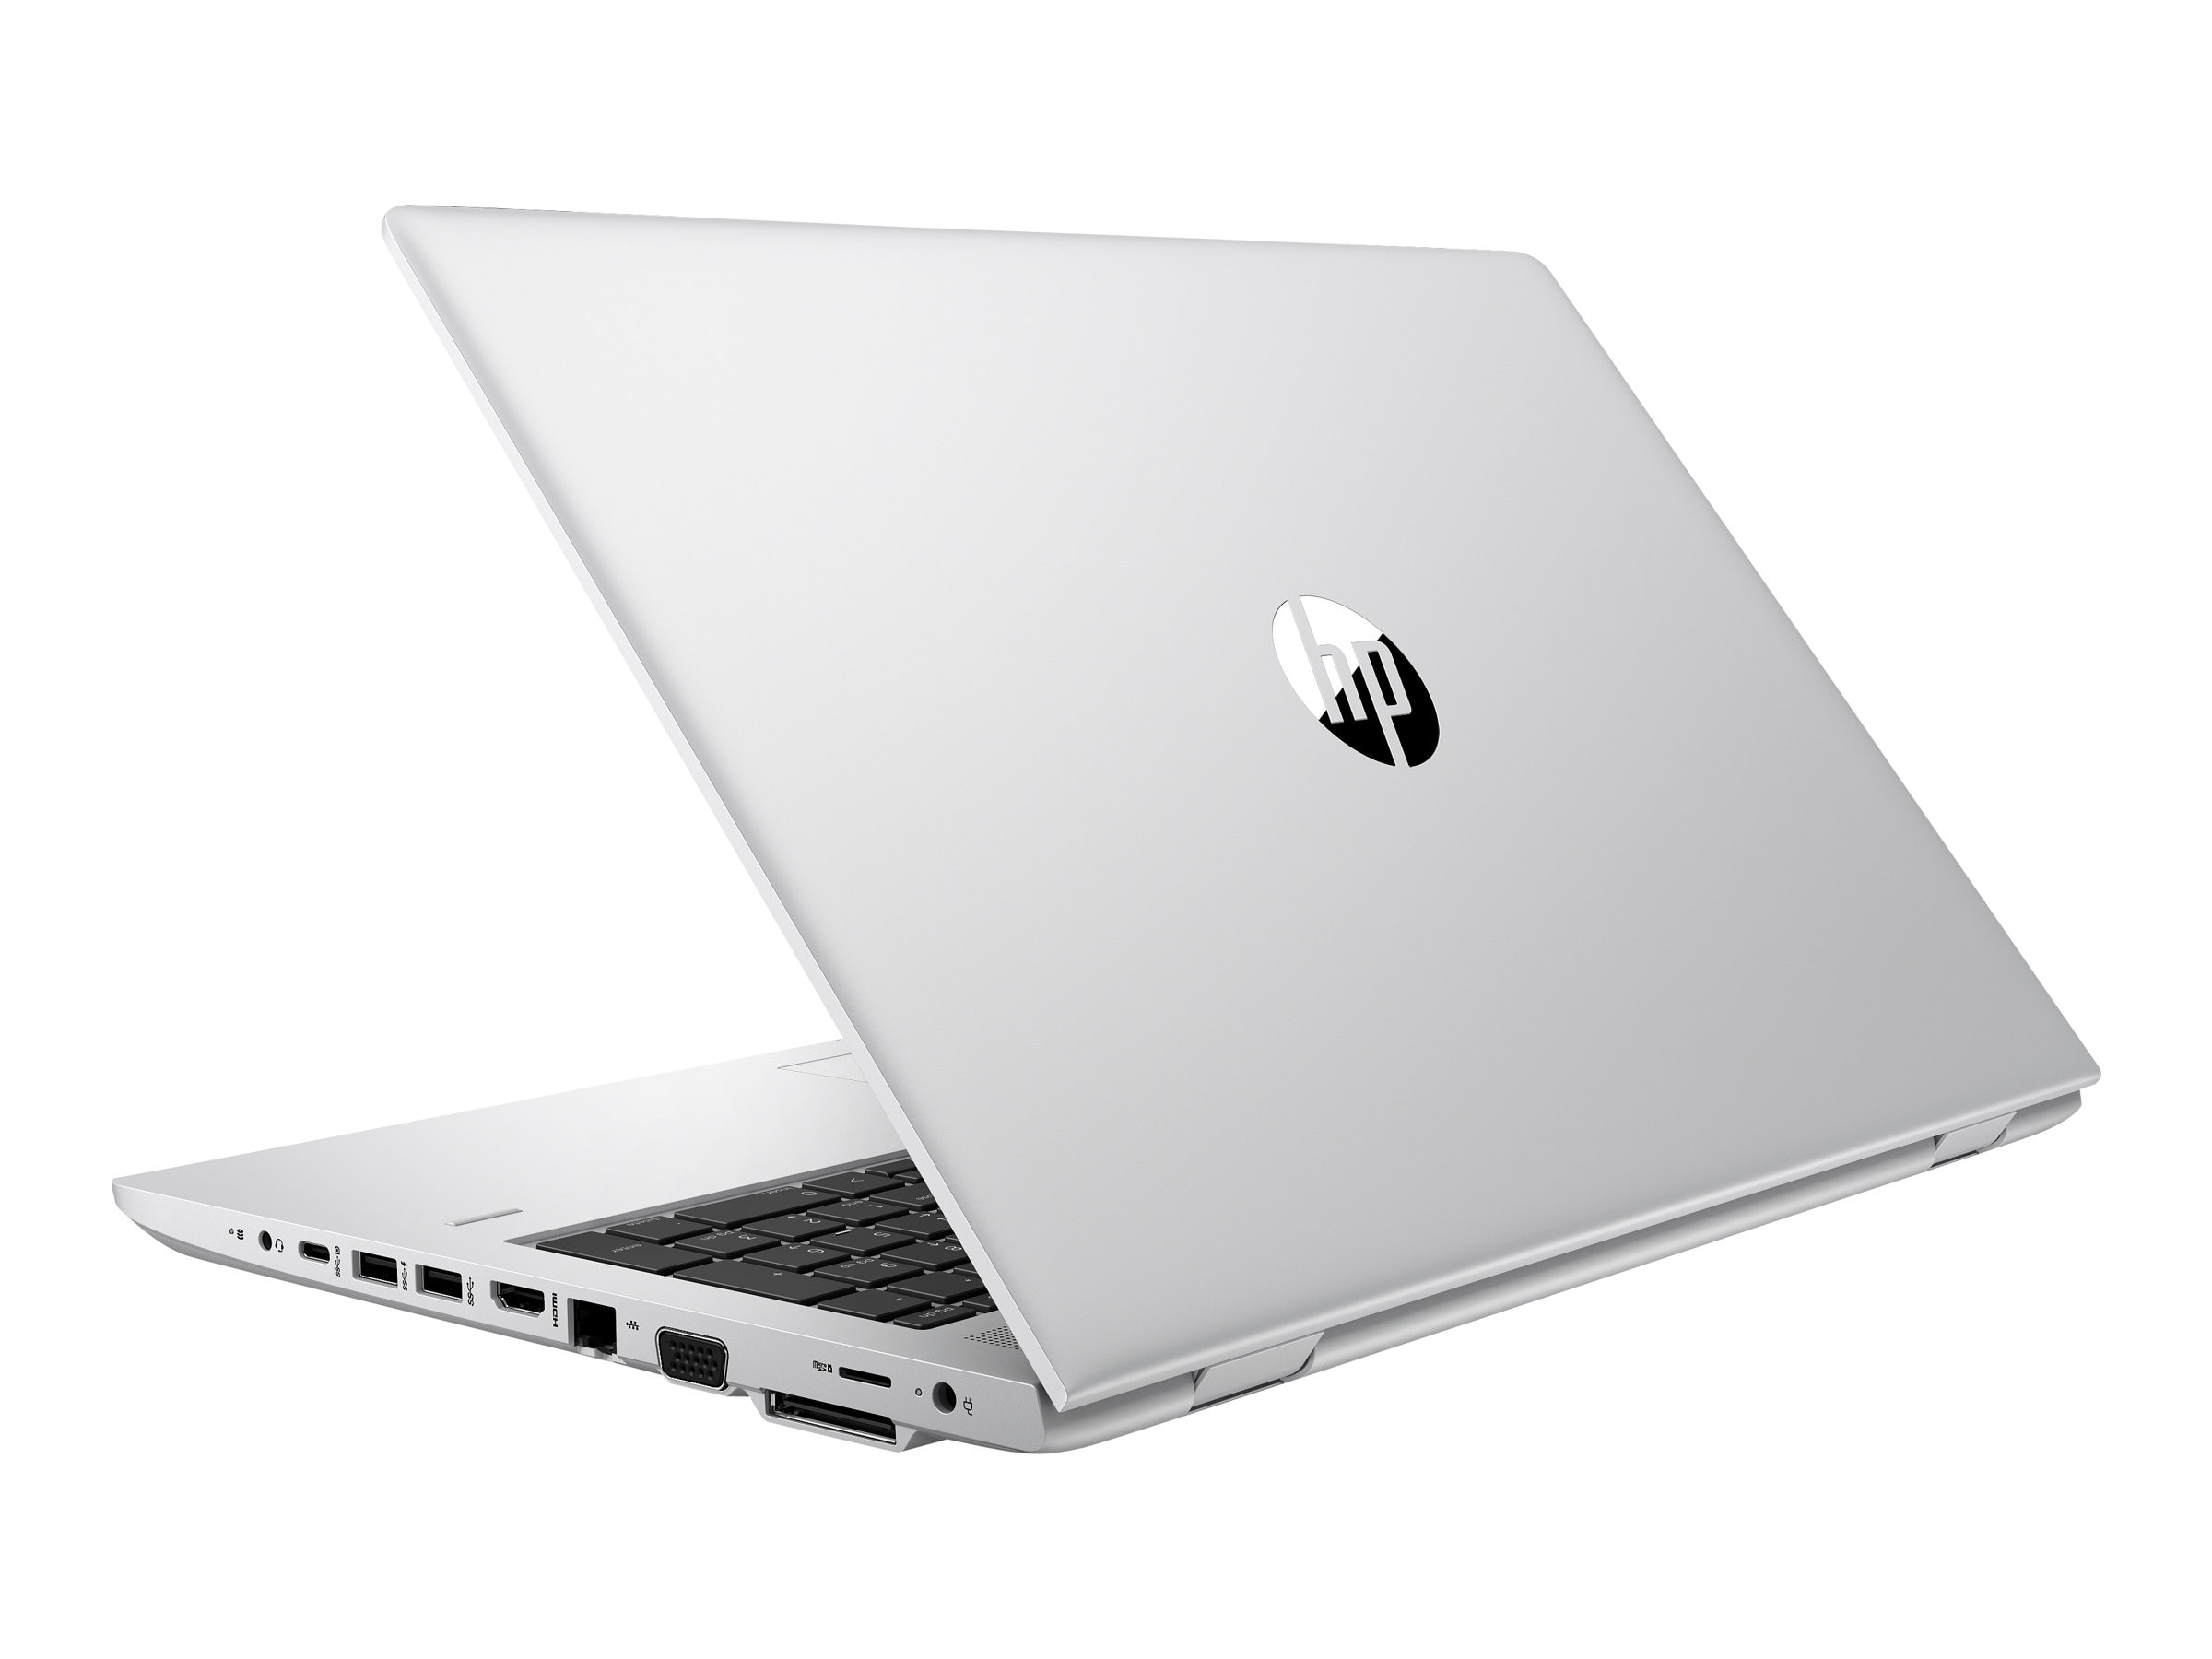 HP ProBook 650 G4 2 6GHz Core i7 15 6in display